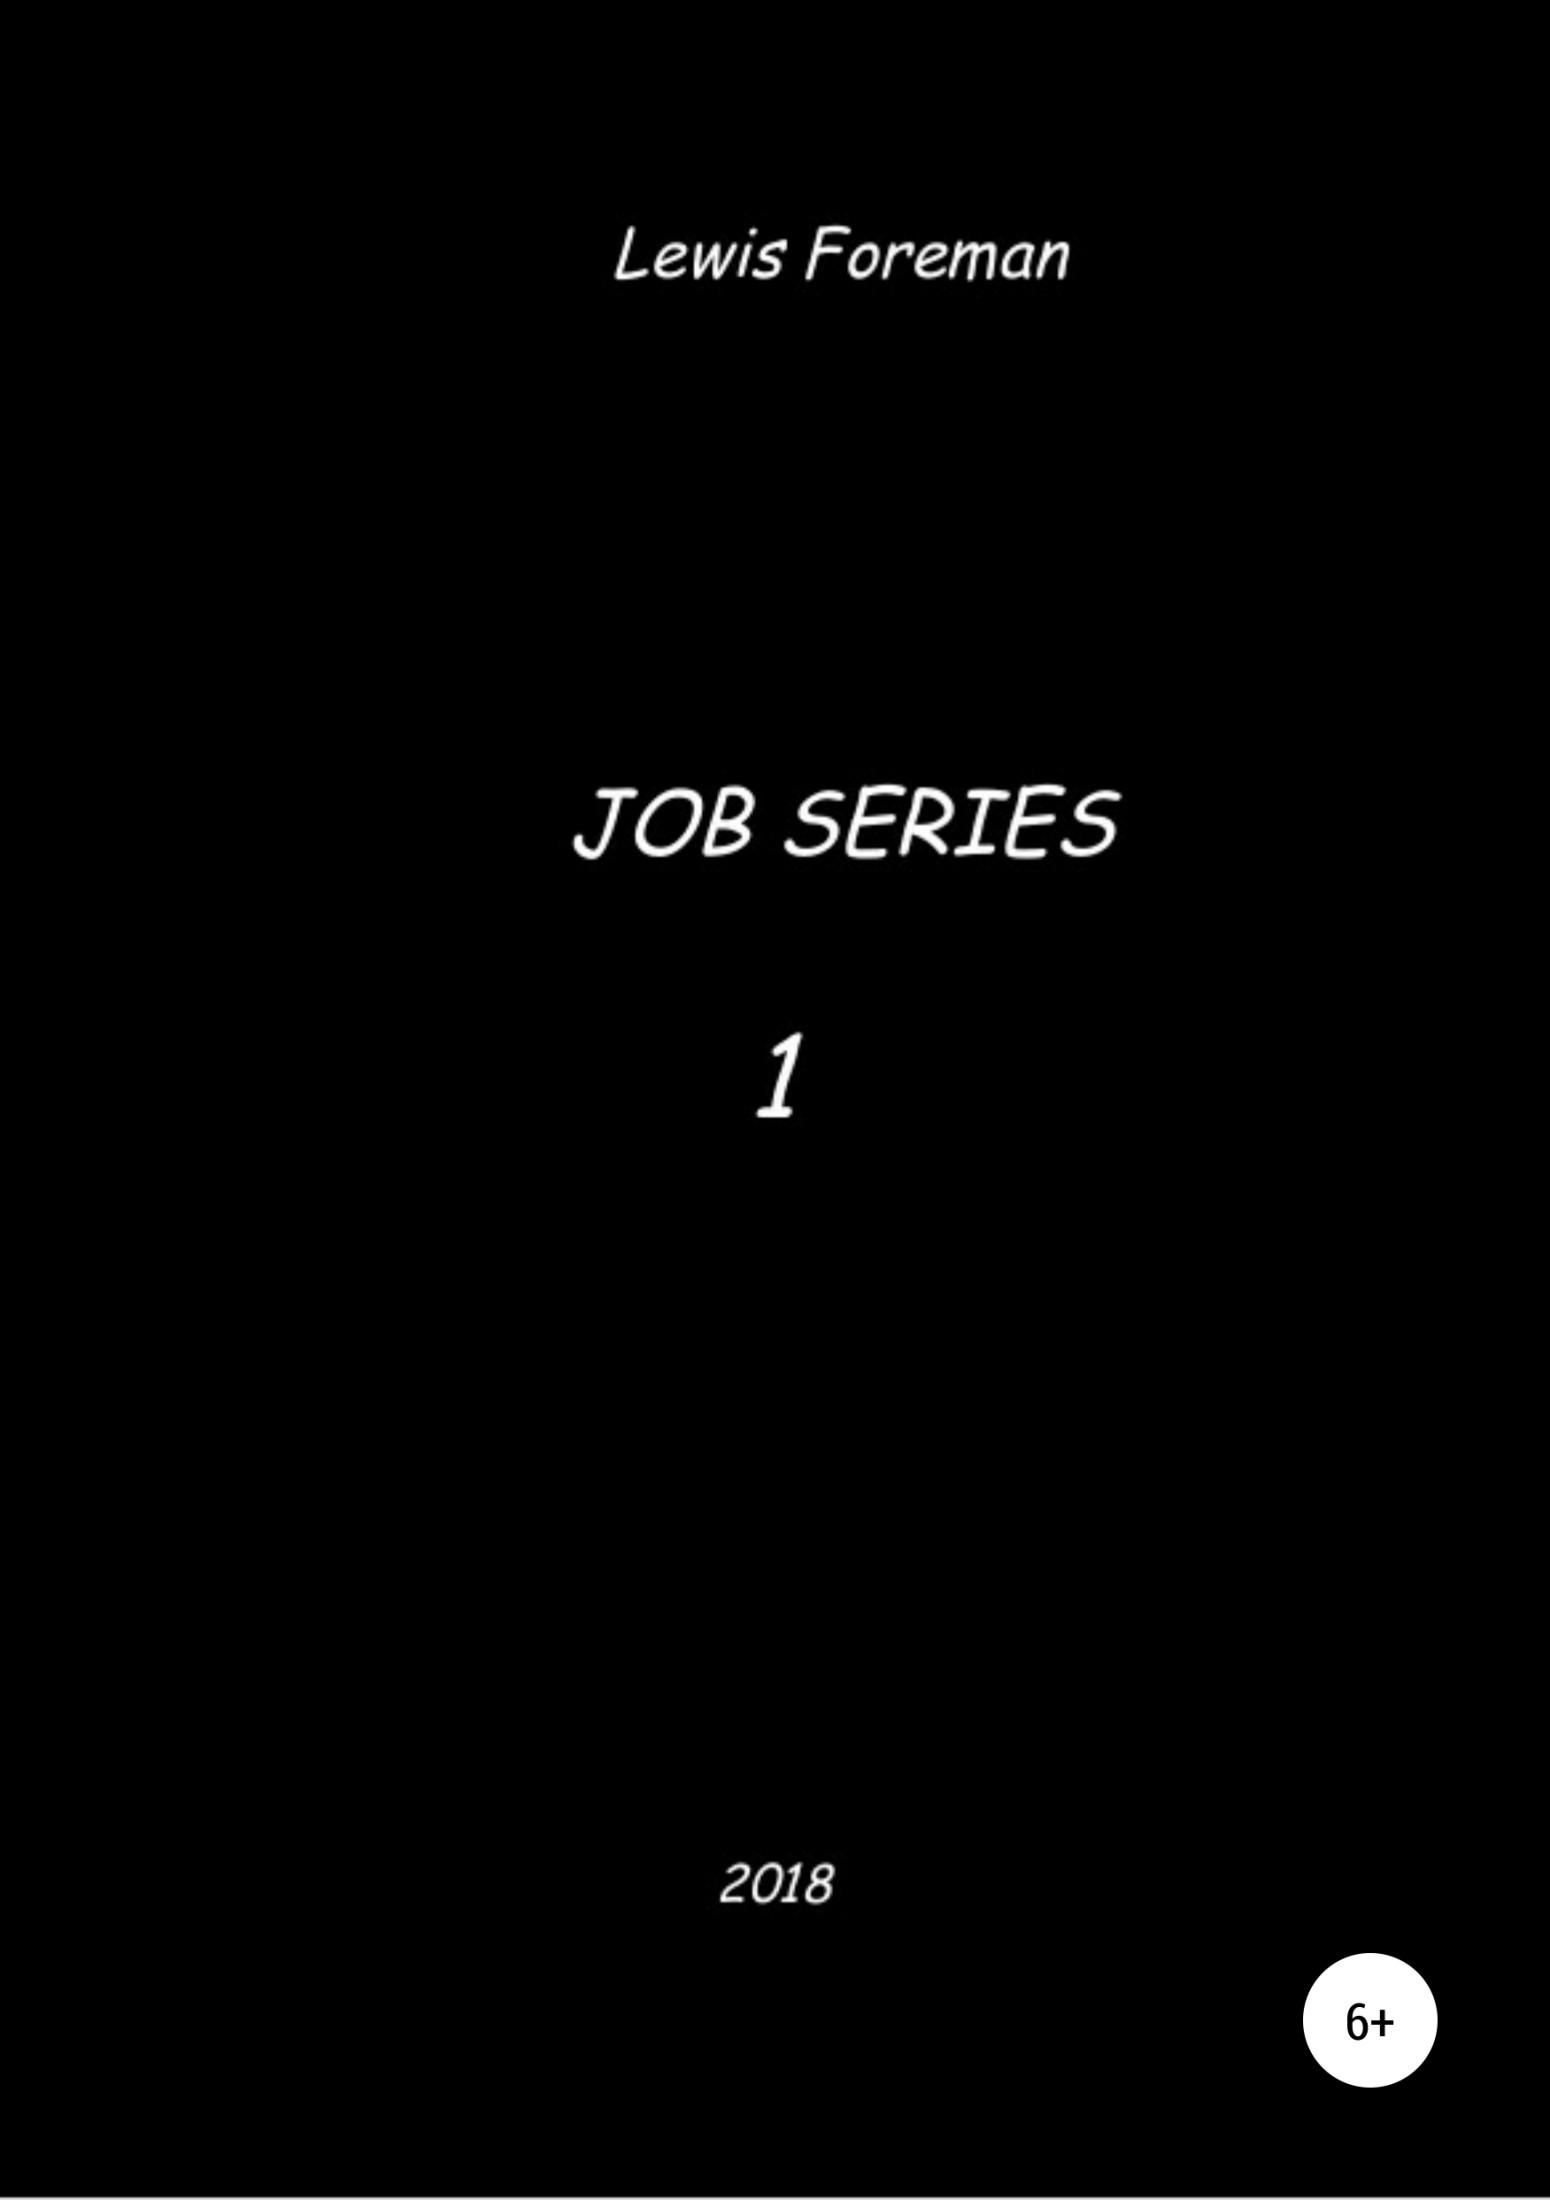 Lewis Foreman Job Series. Part ONE inventive components of portmanteau words